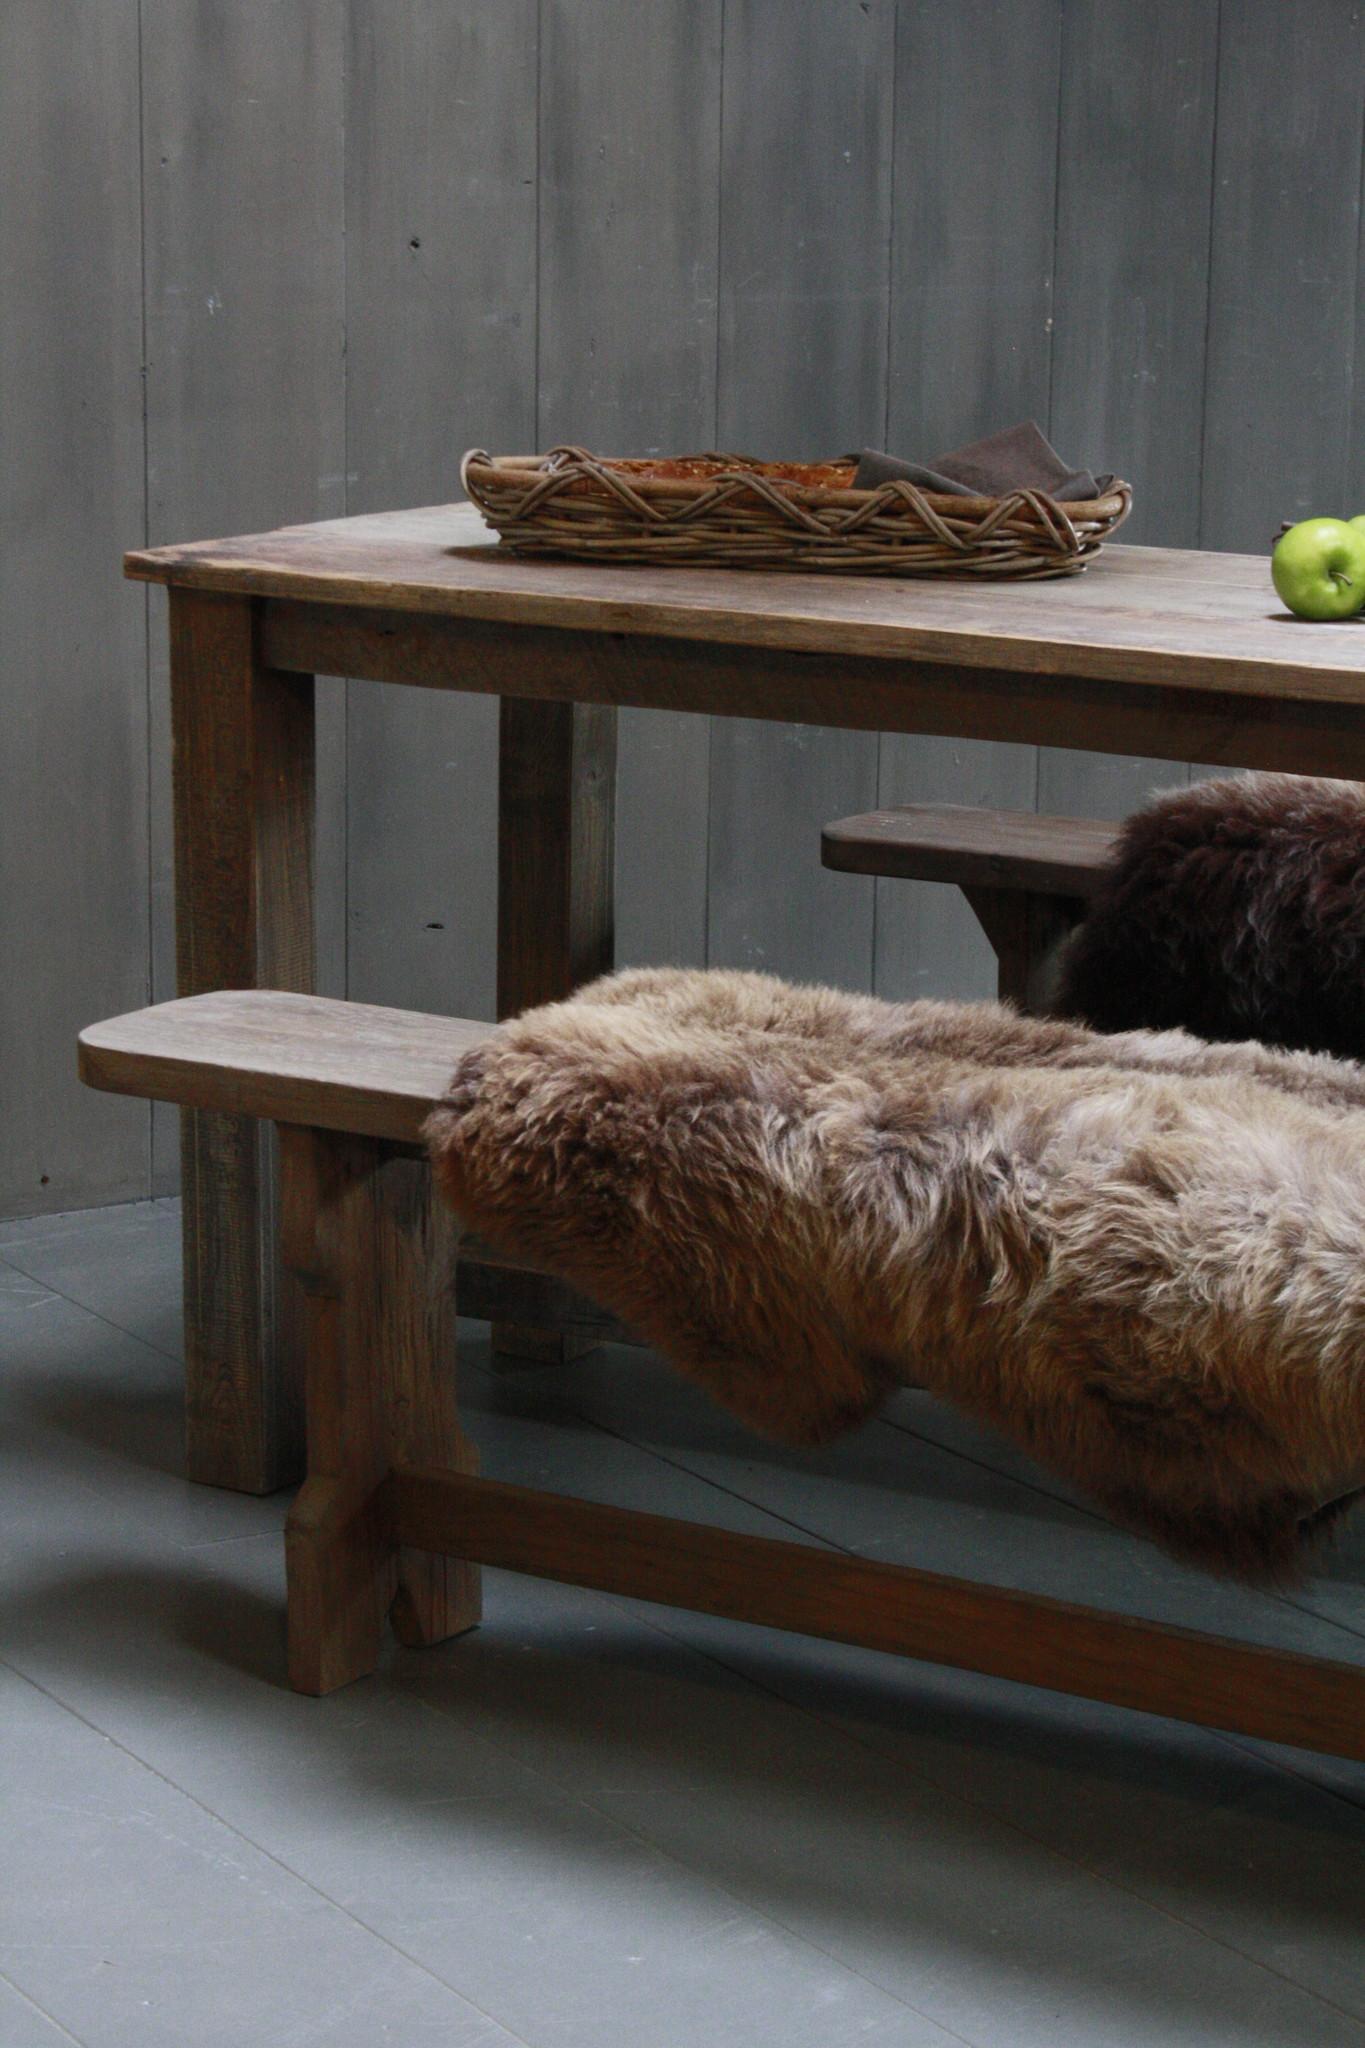 Oud houten eetkamer set met 2 houten bankjes-5